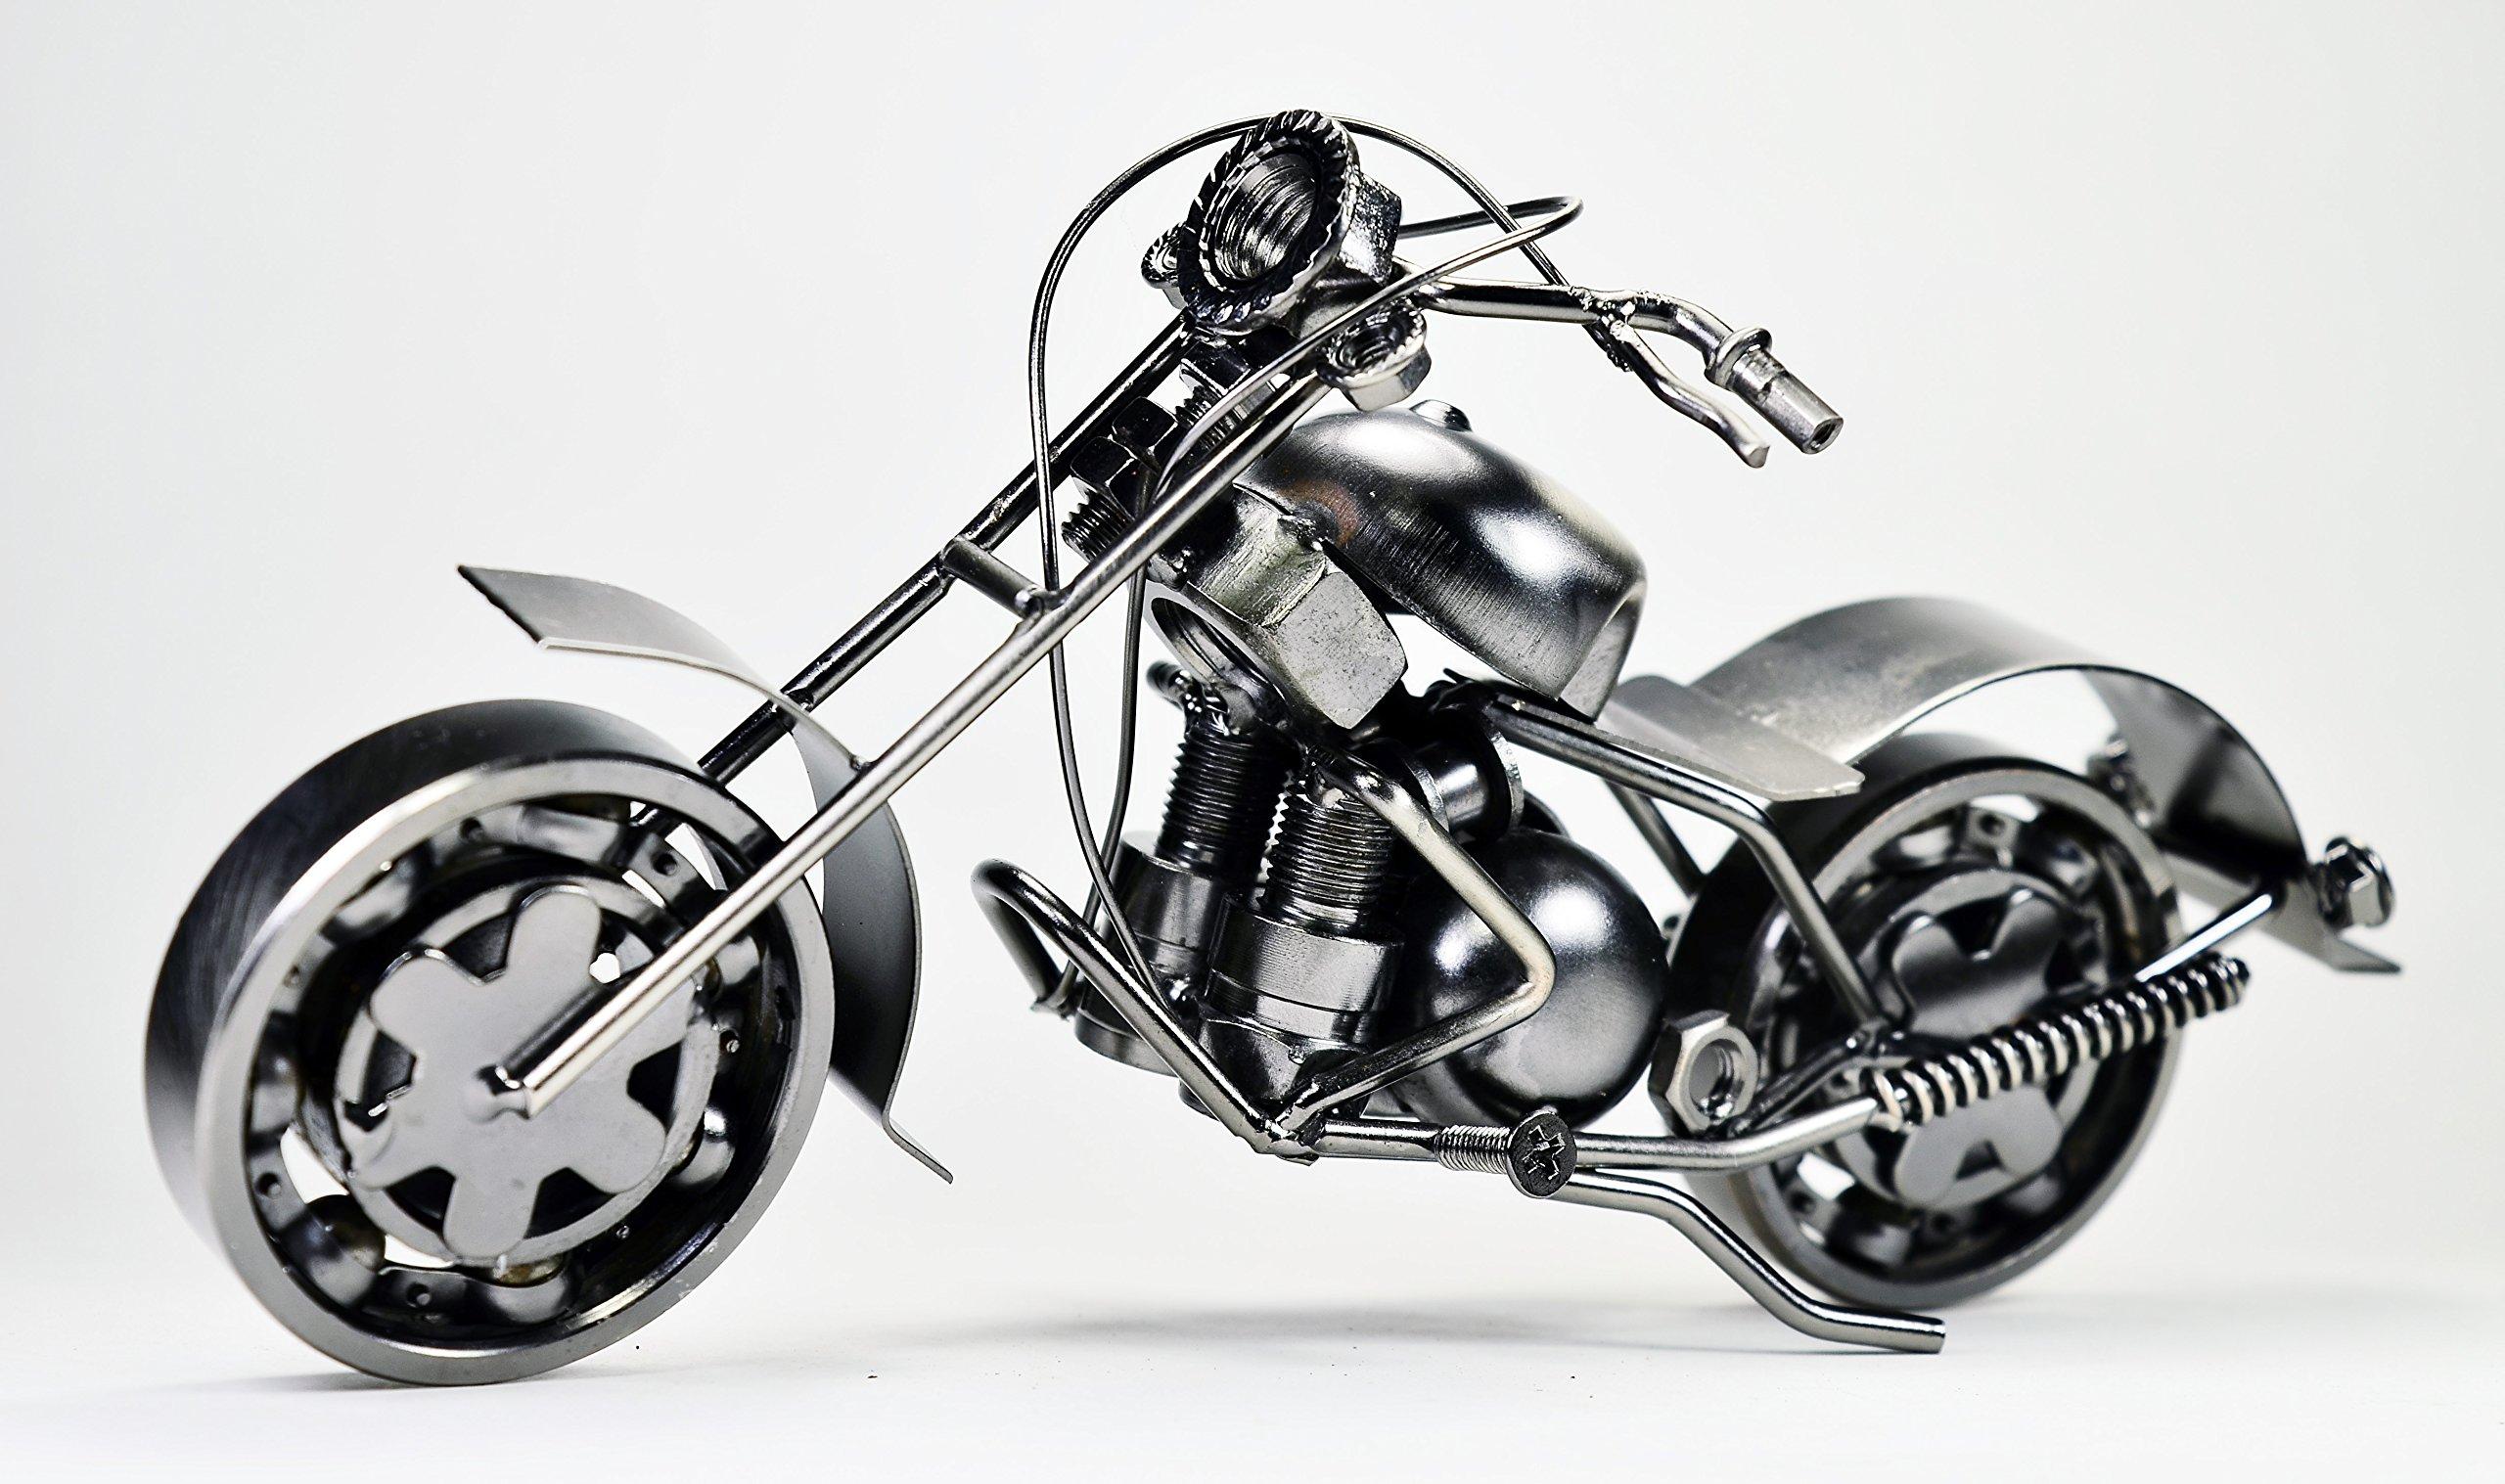 Harley Davidson Metal Sculpture Retro Classic Handmade Iron Motorcycle Model ET01C